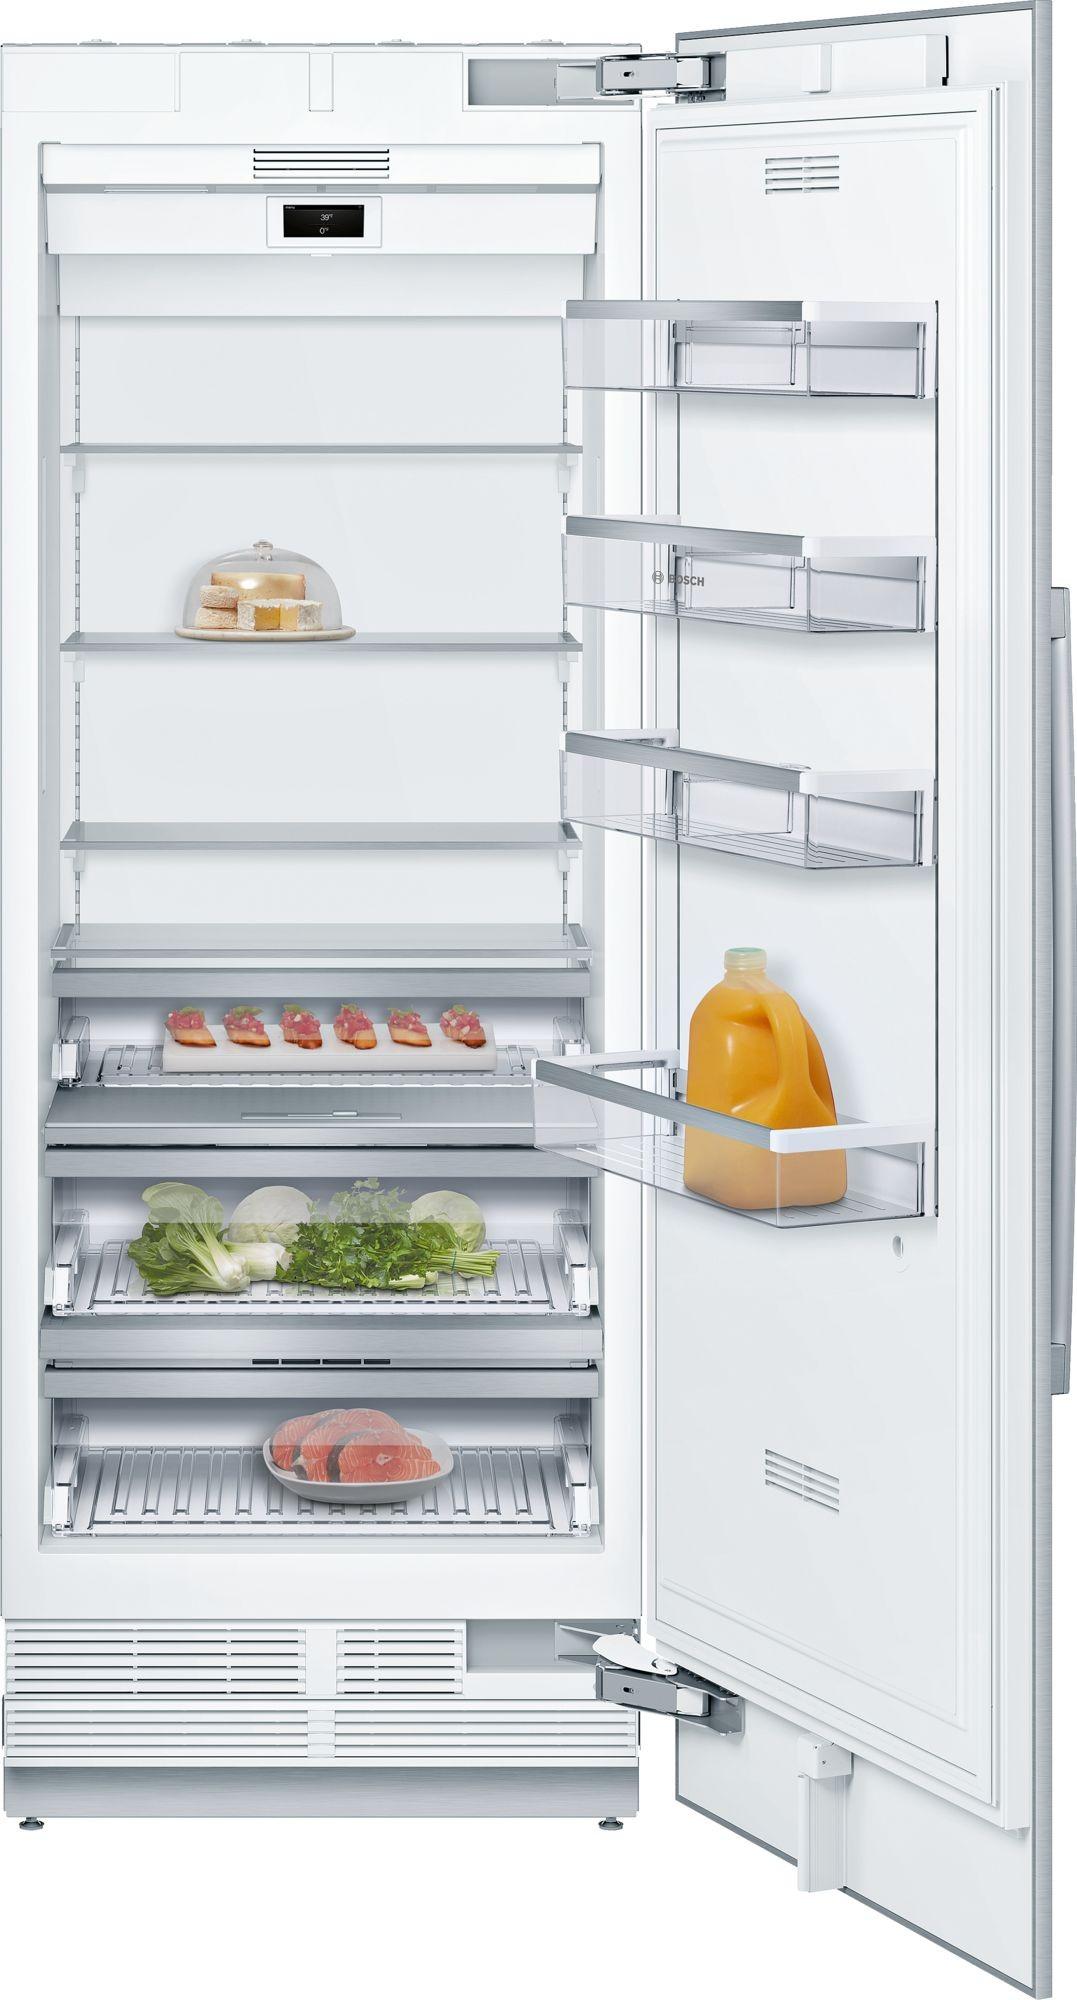 Bosch 30 Inch Built-In Panel-Ready Single Door Refrigerator